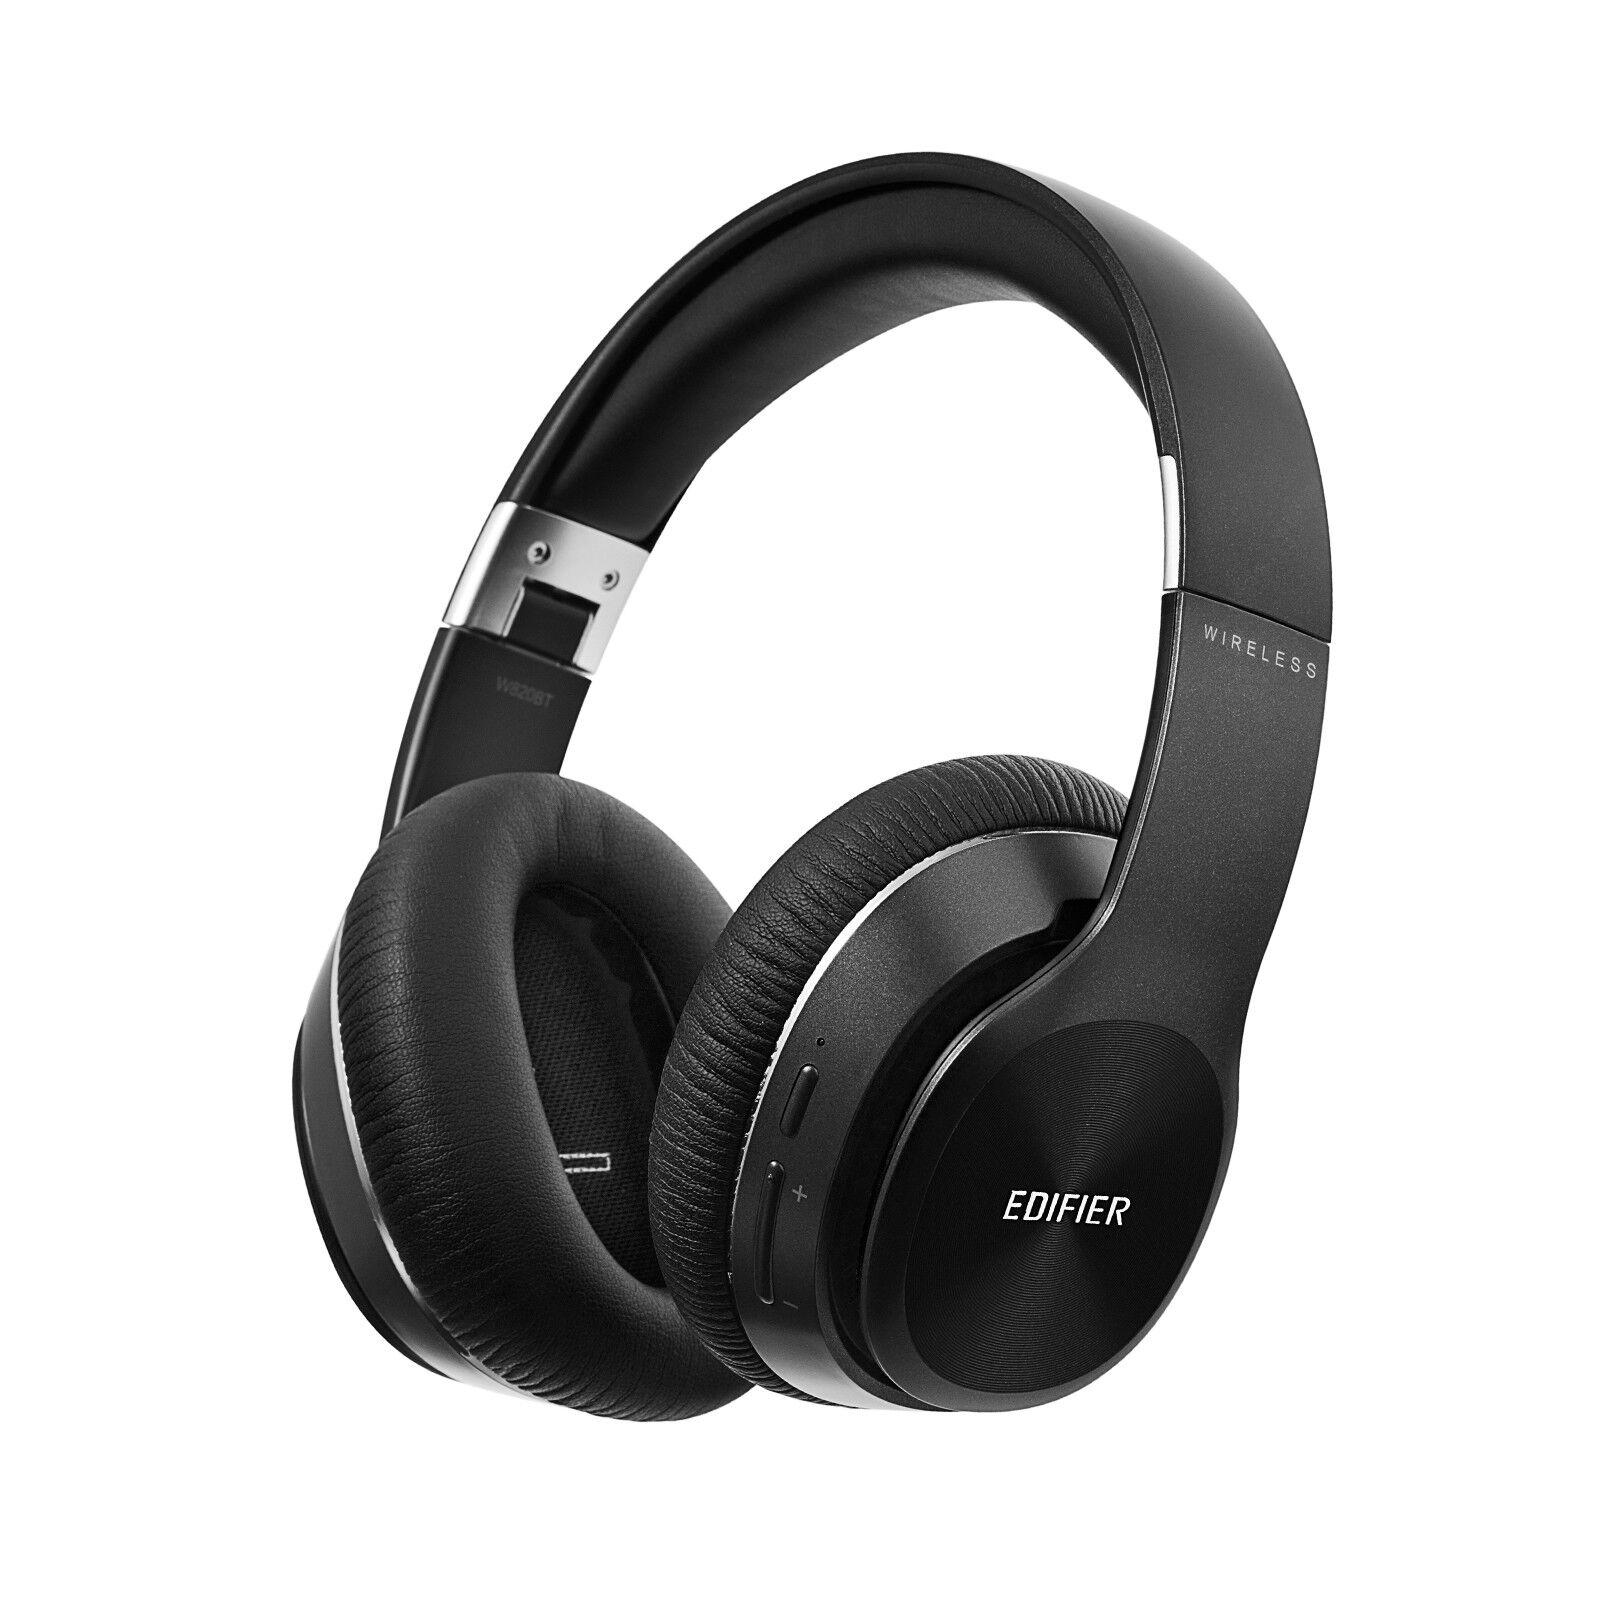 Edifier W820BT Bluetooth Headphones Foldable 80 Hours of Bat